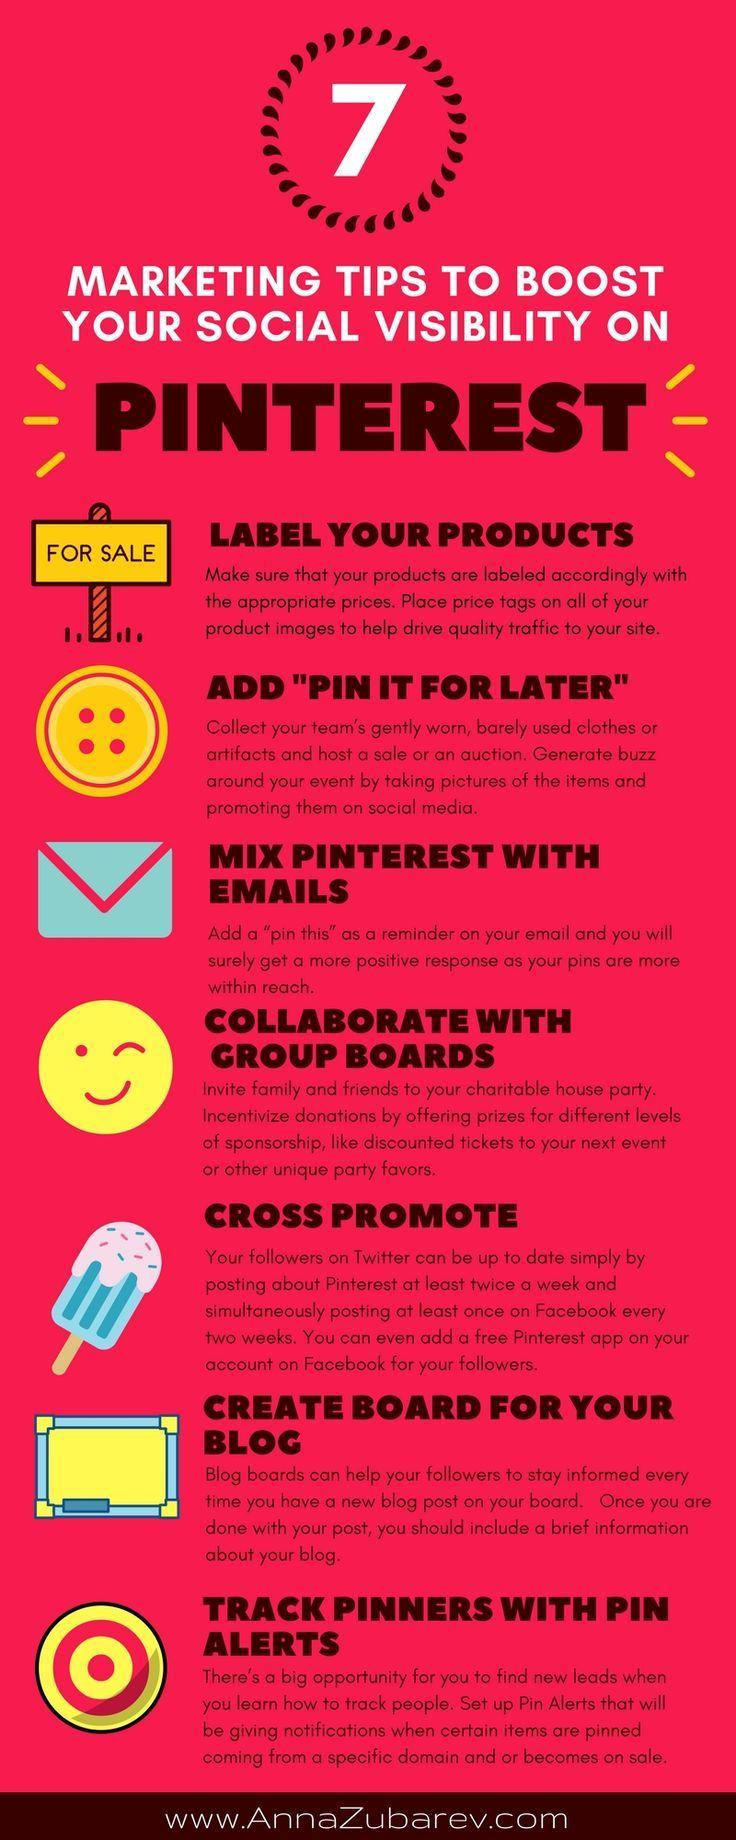 7 Marketing Tips to Boost Your Social Visibility on Pinterest. via /annazubarev/ via /https/://www.pinterest.com/annazubarev/